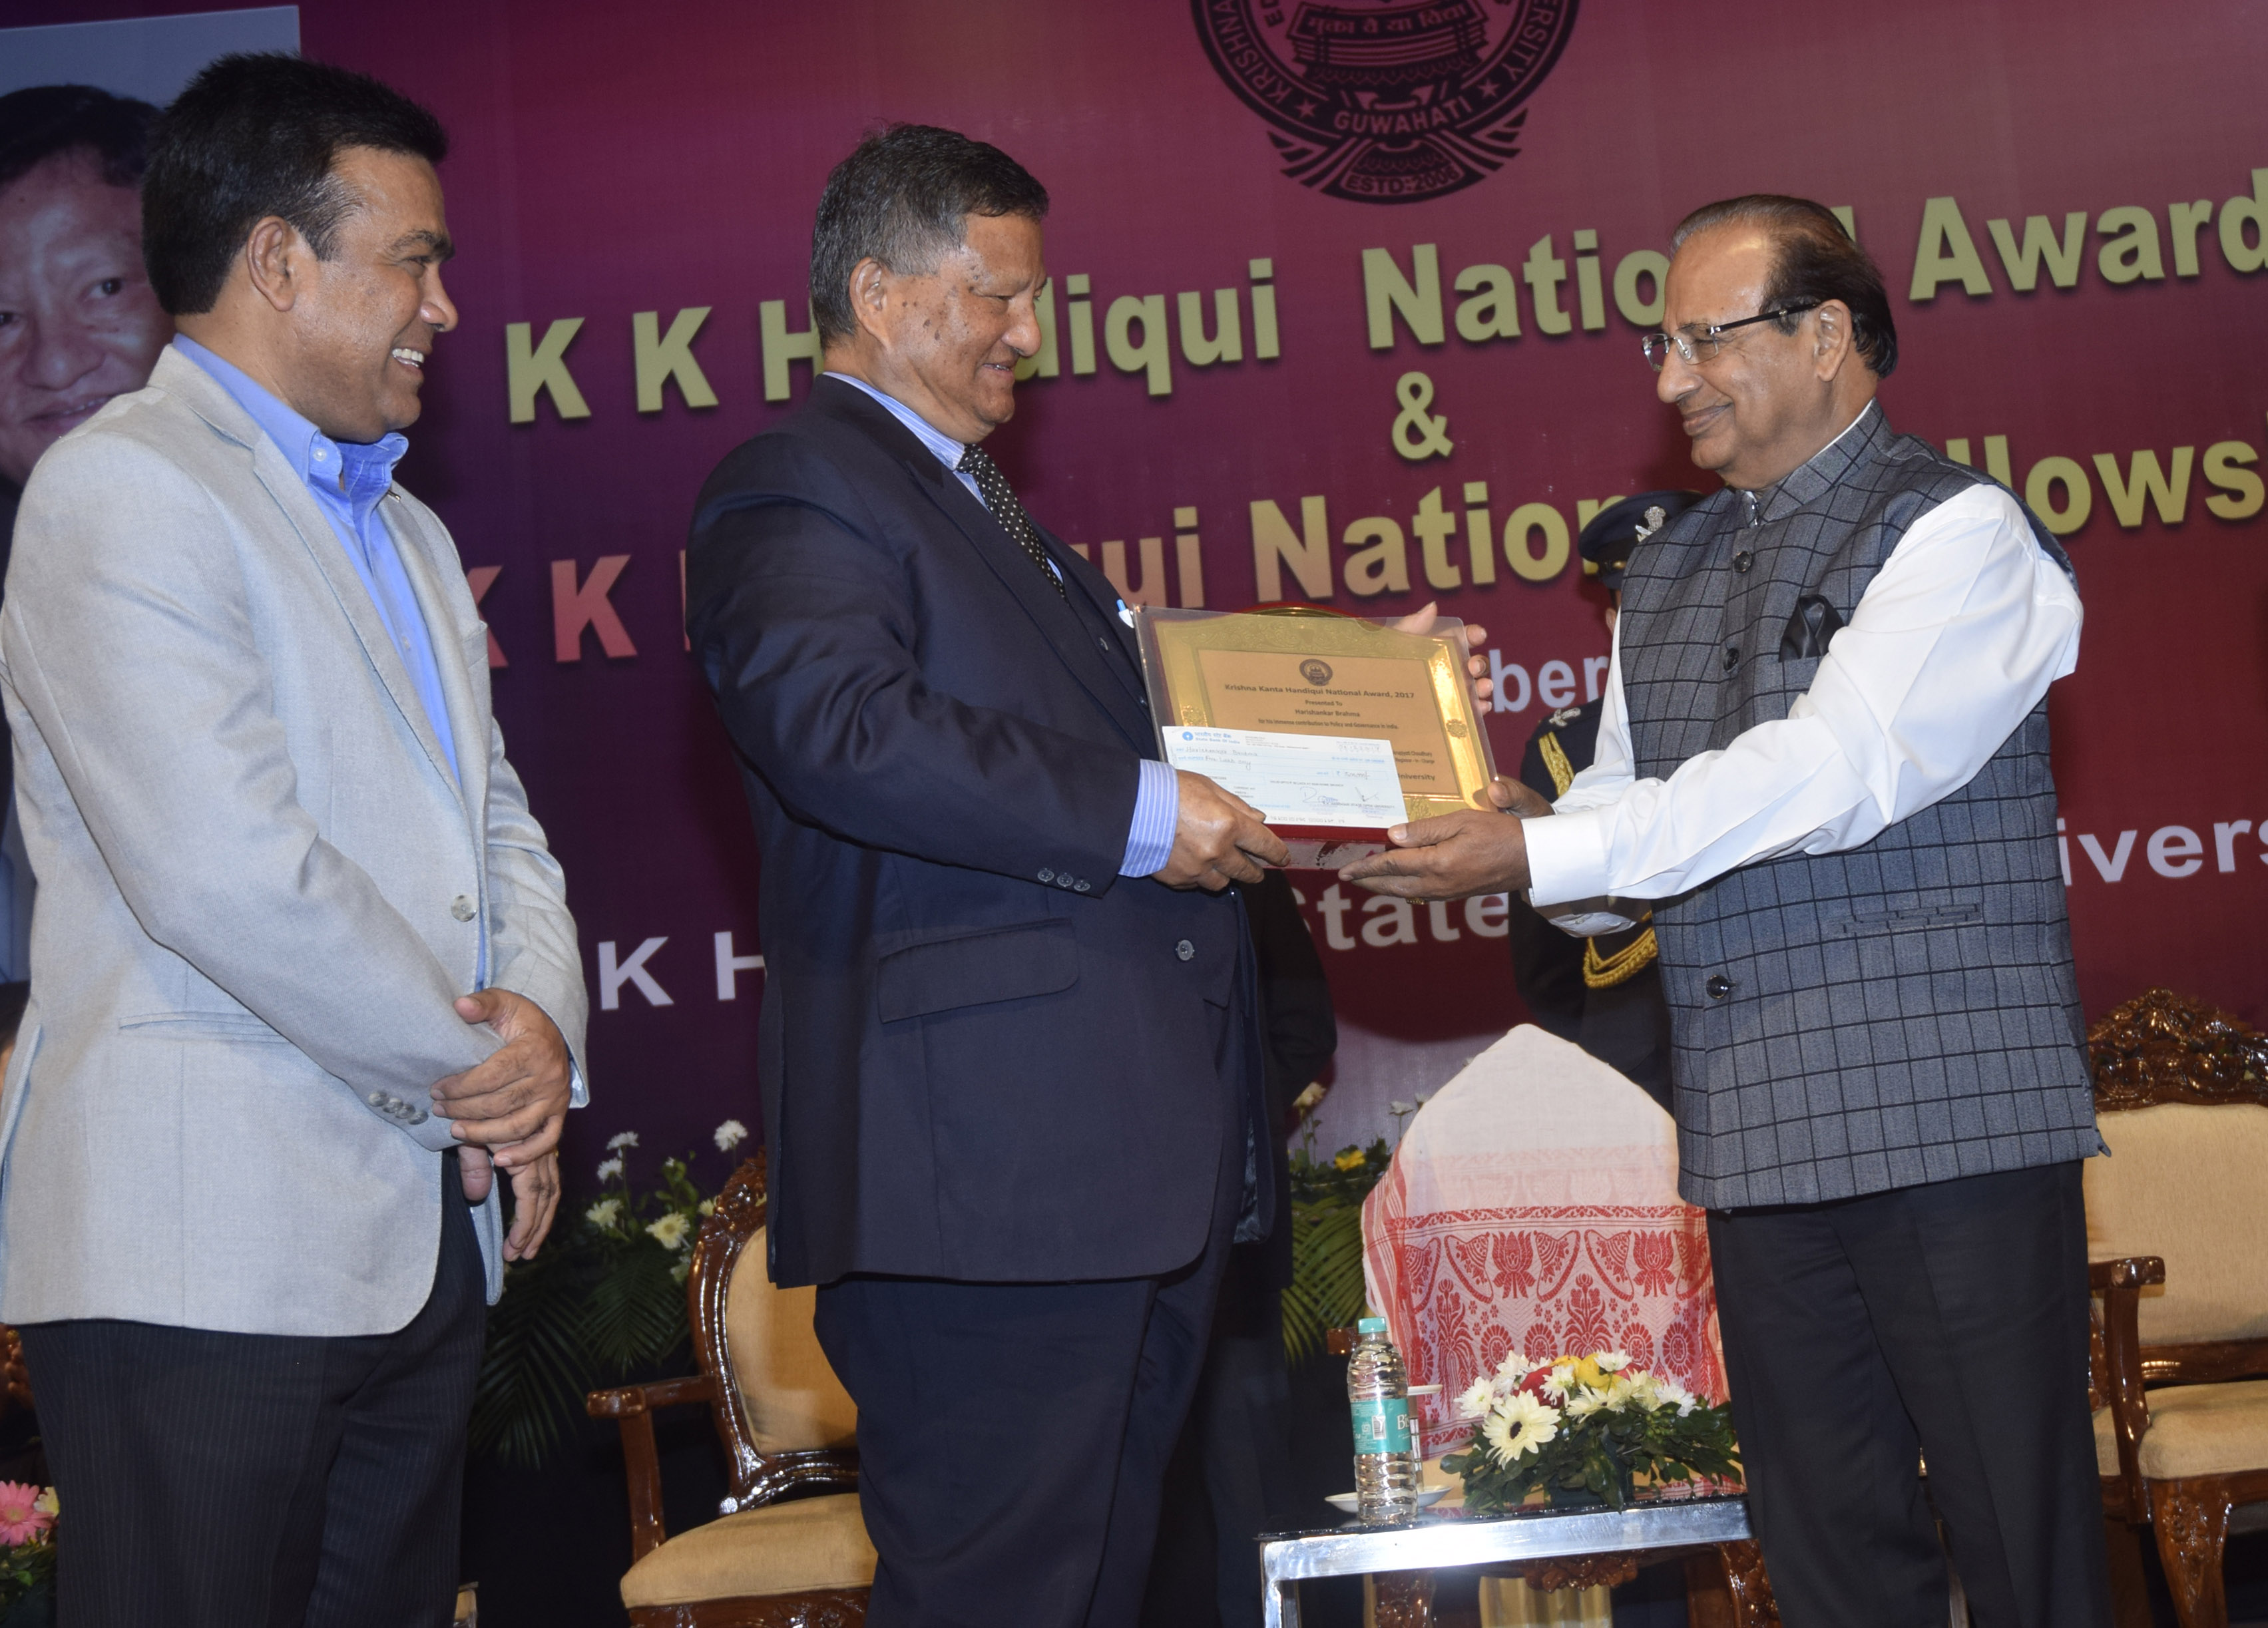 KK Handiqui National Awards given away 1